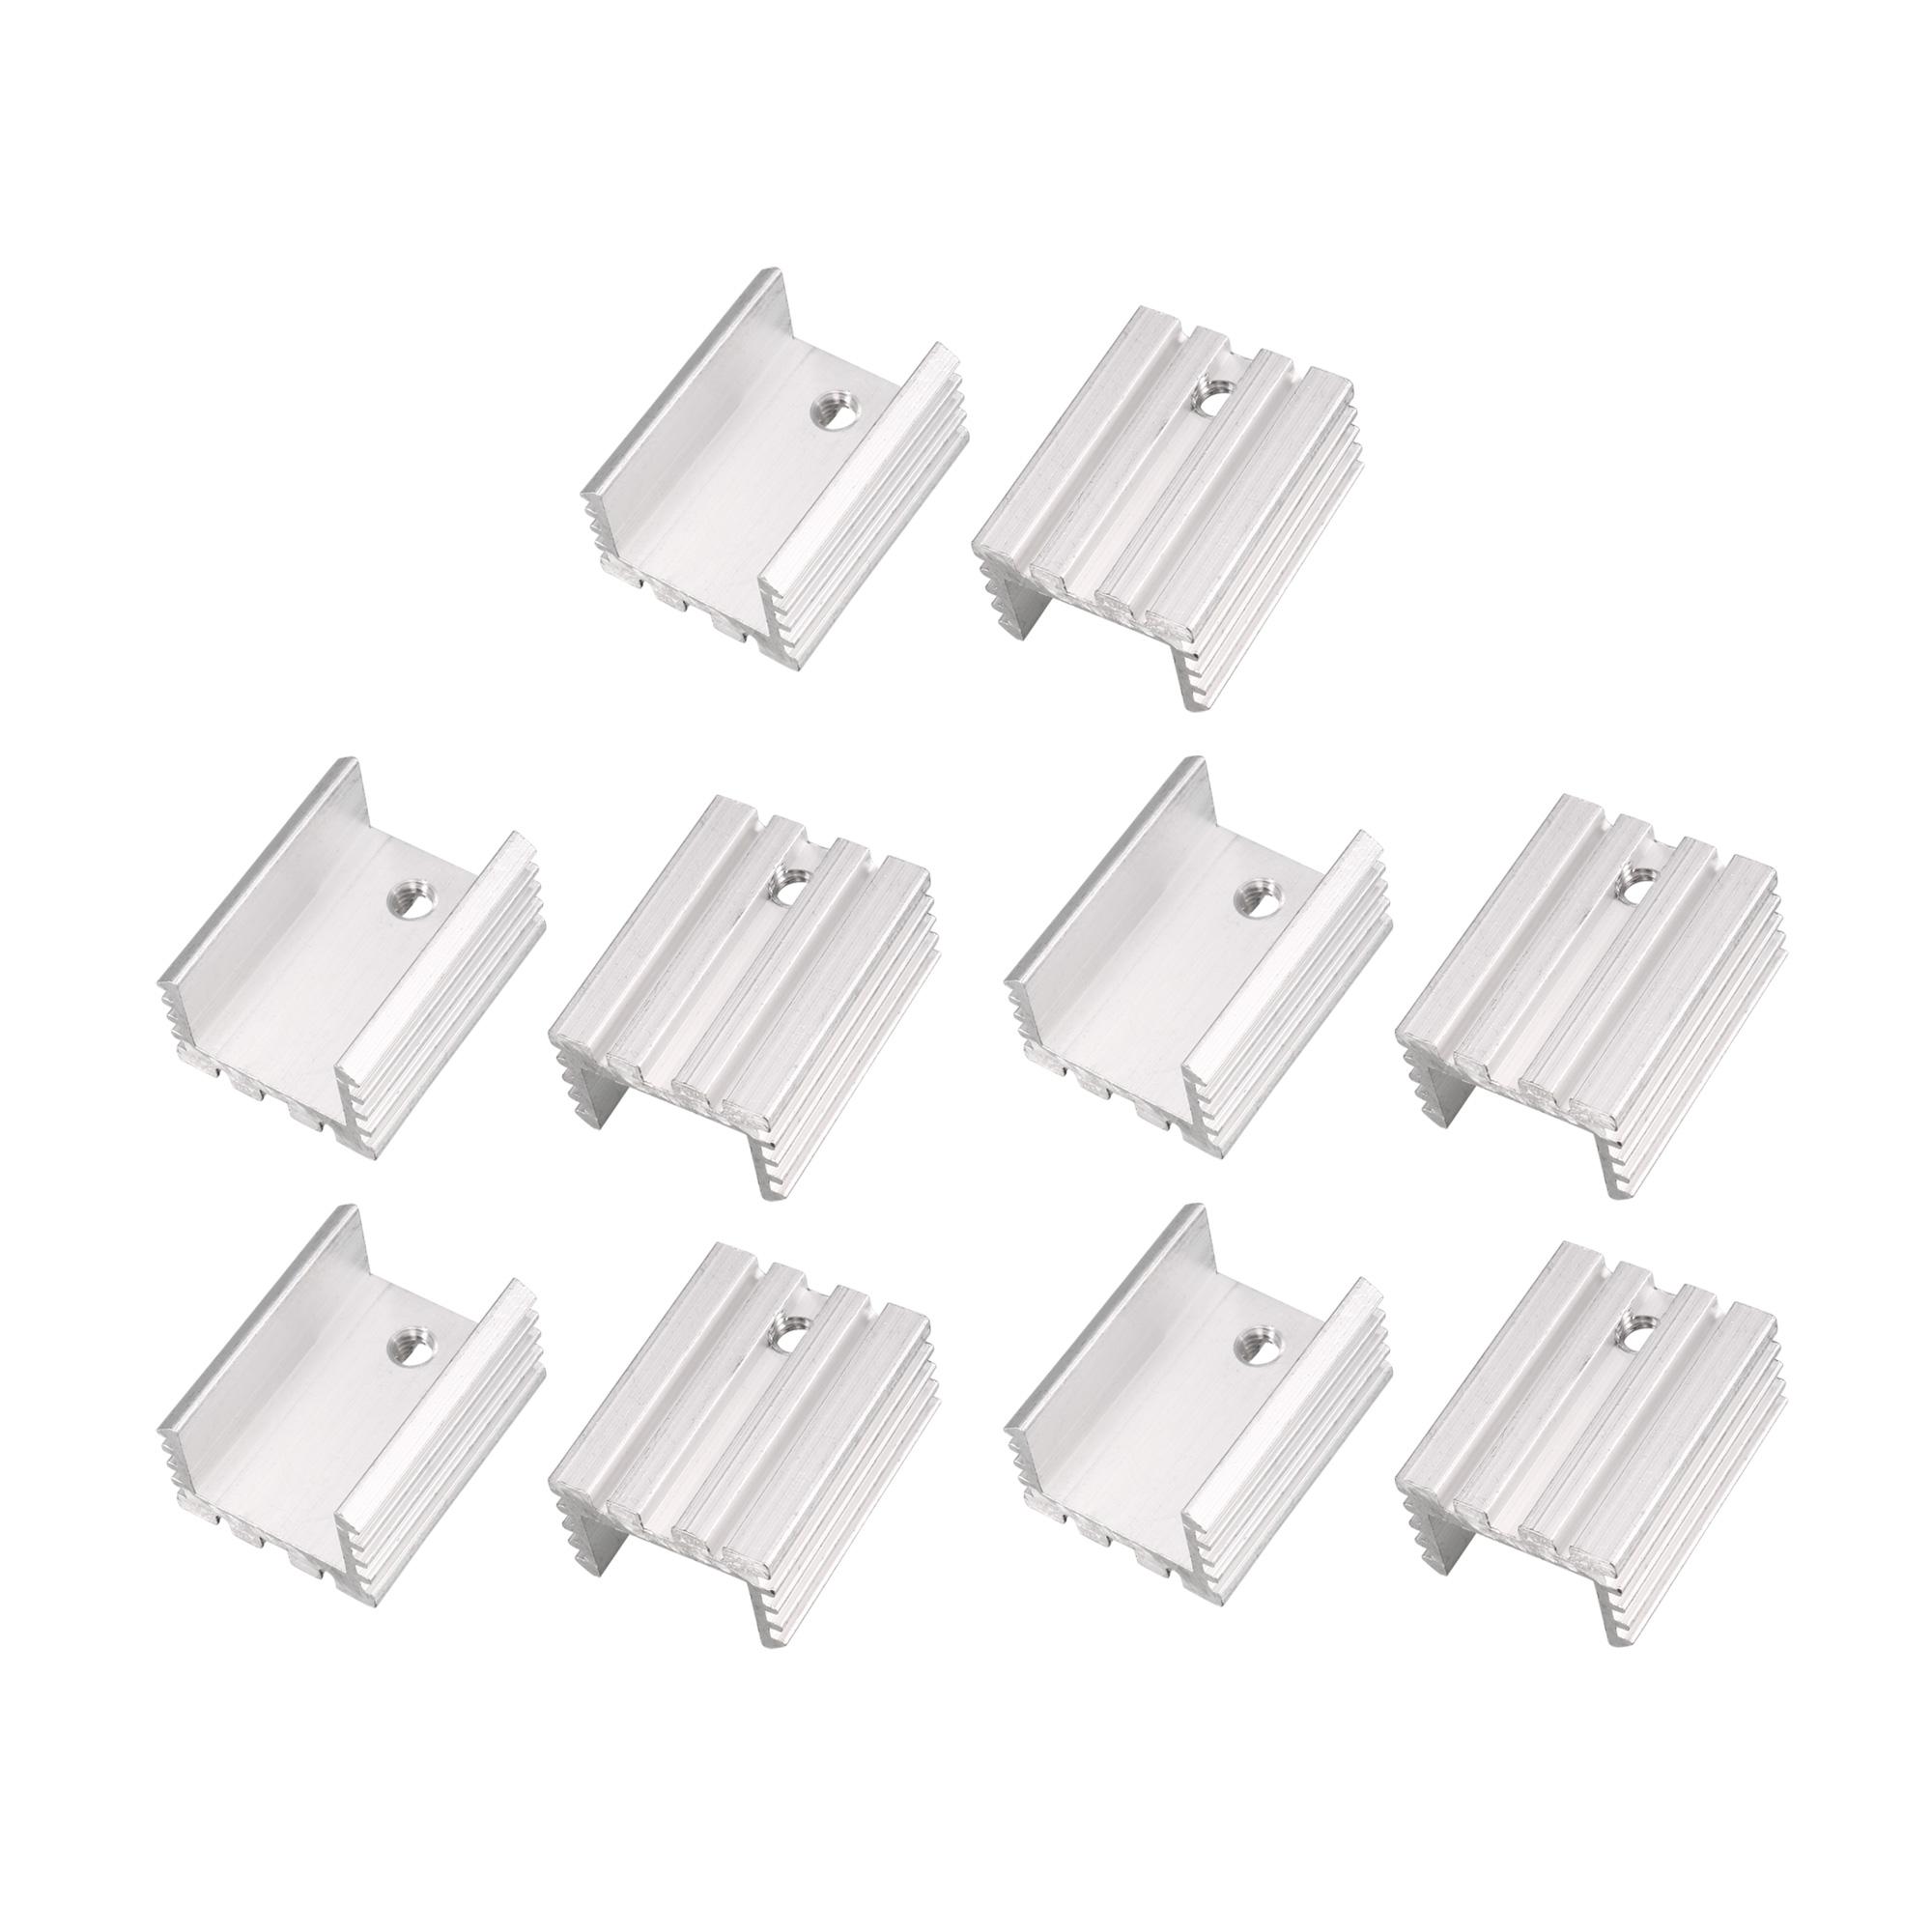 10 Pcs 21x15x10mm Silver Tone Aluminum Heat Sink for TO-220 Transistors